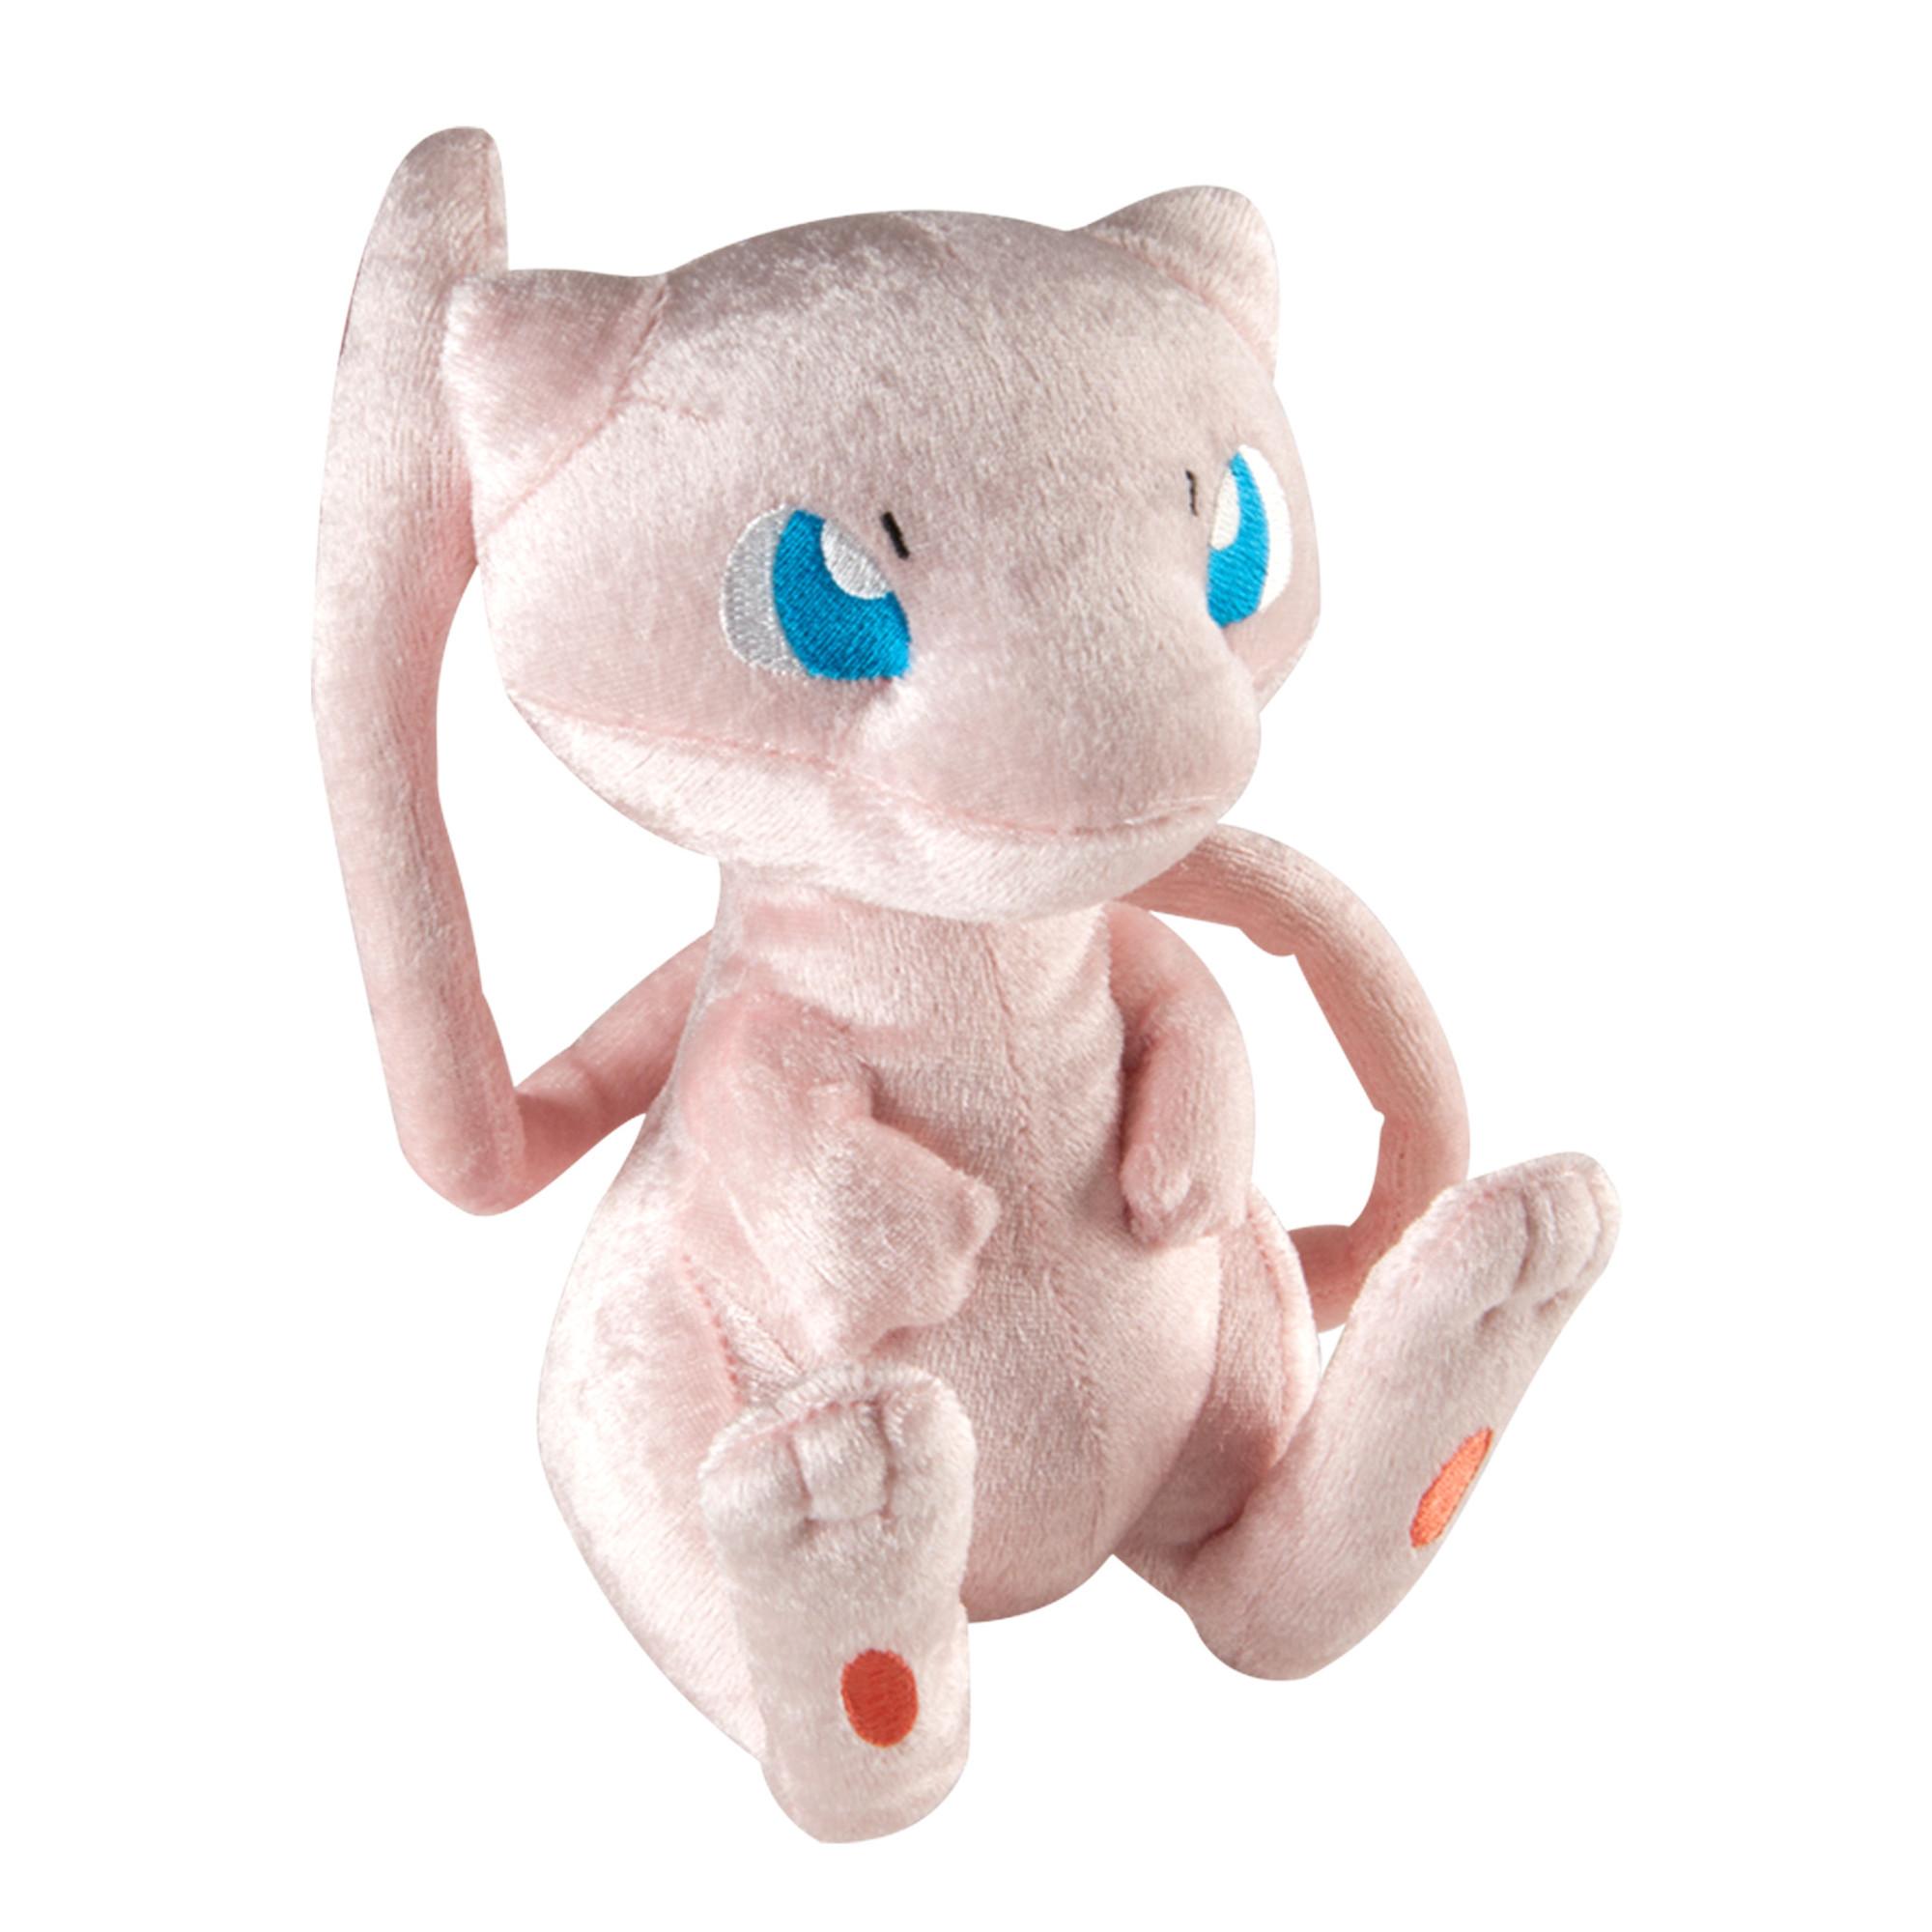 Soft Plush Toys : Mythical mew kicks off year long pokemon distribution